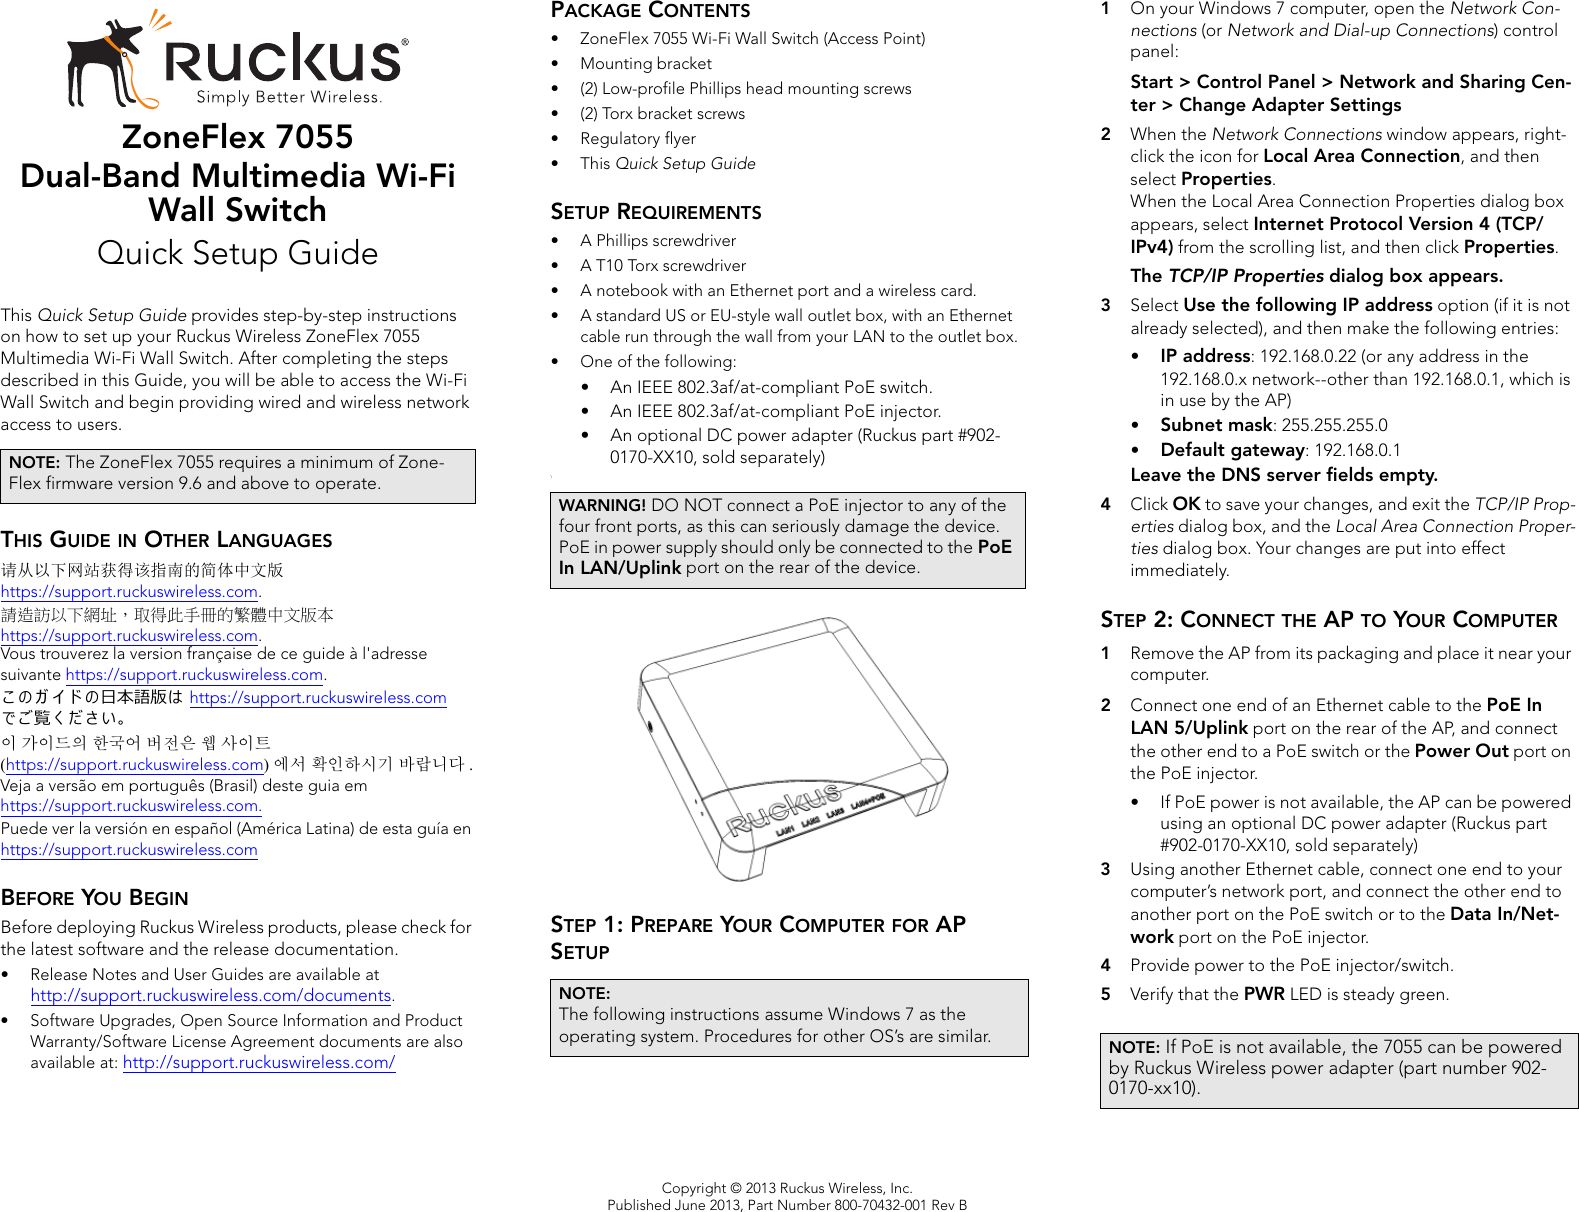 Ruckus Wireless Ap Zf2942 7942 Quick Setup Guide Zone Flex Zf7055 Ethernet Wall Jack Wiring Poe 7055 Qsg 800 70432 001 Rev B 20130614